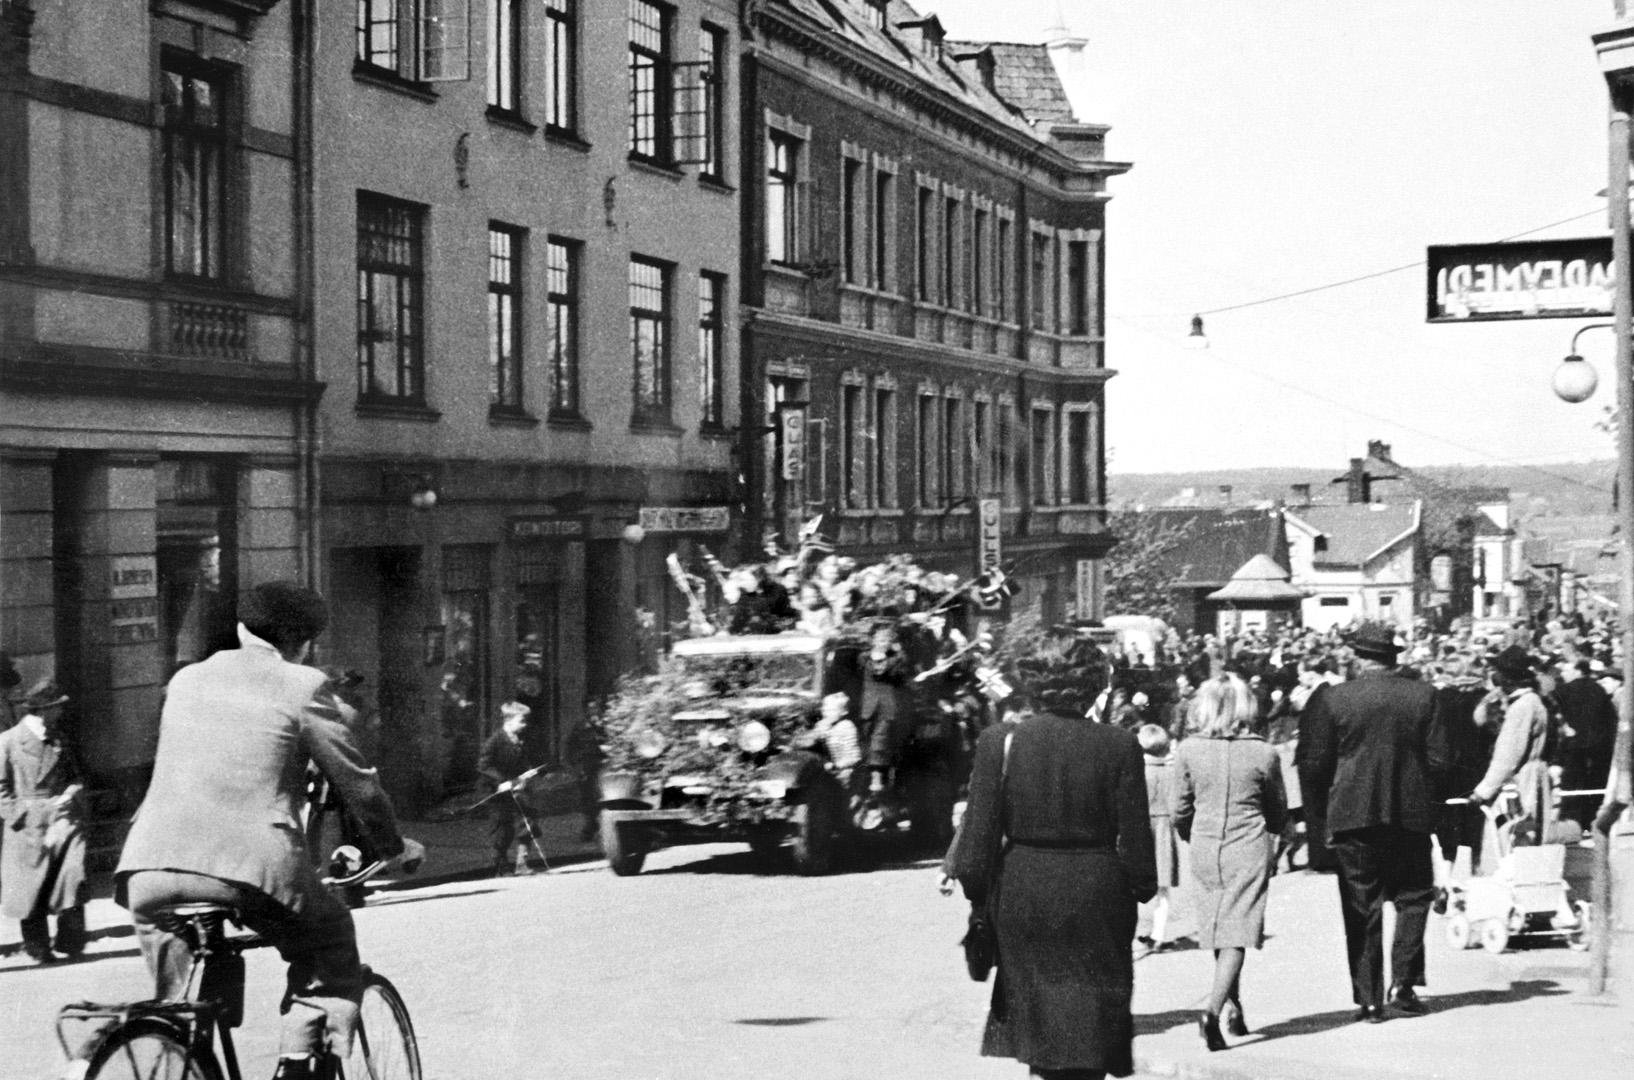 ØFB.1979-00116 Fredsbegeistring i Sarpsborg 8. mai 1945, reservepolitiet kommer hjem fra Sverige. Foto: Rolv Bjøreid / Østfold fylkes billedarkiv.